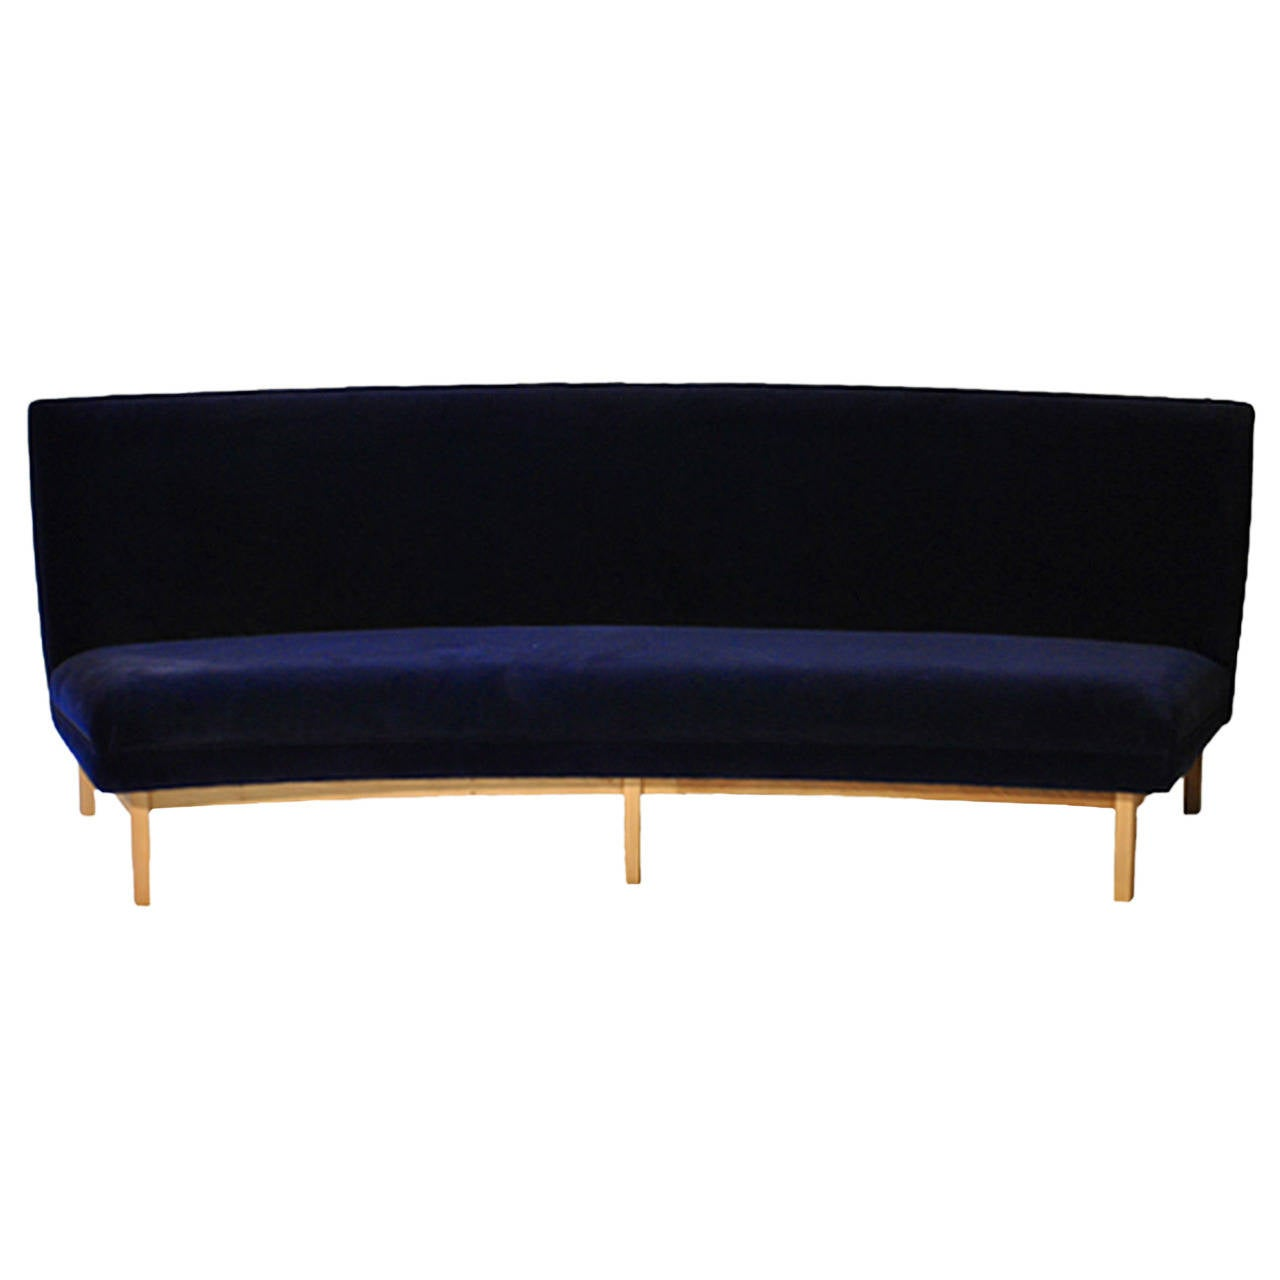 Four seat semicircular sofa at 1stdibs